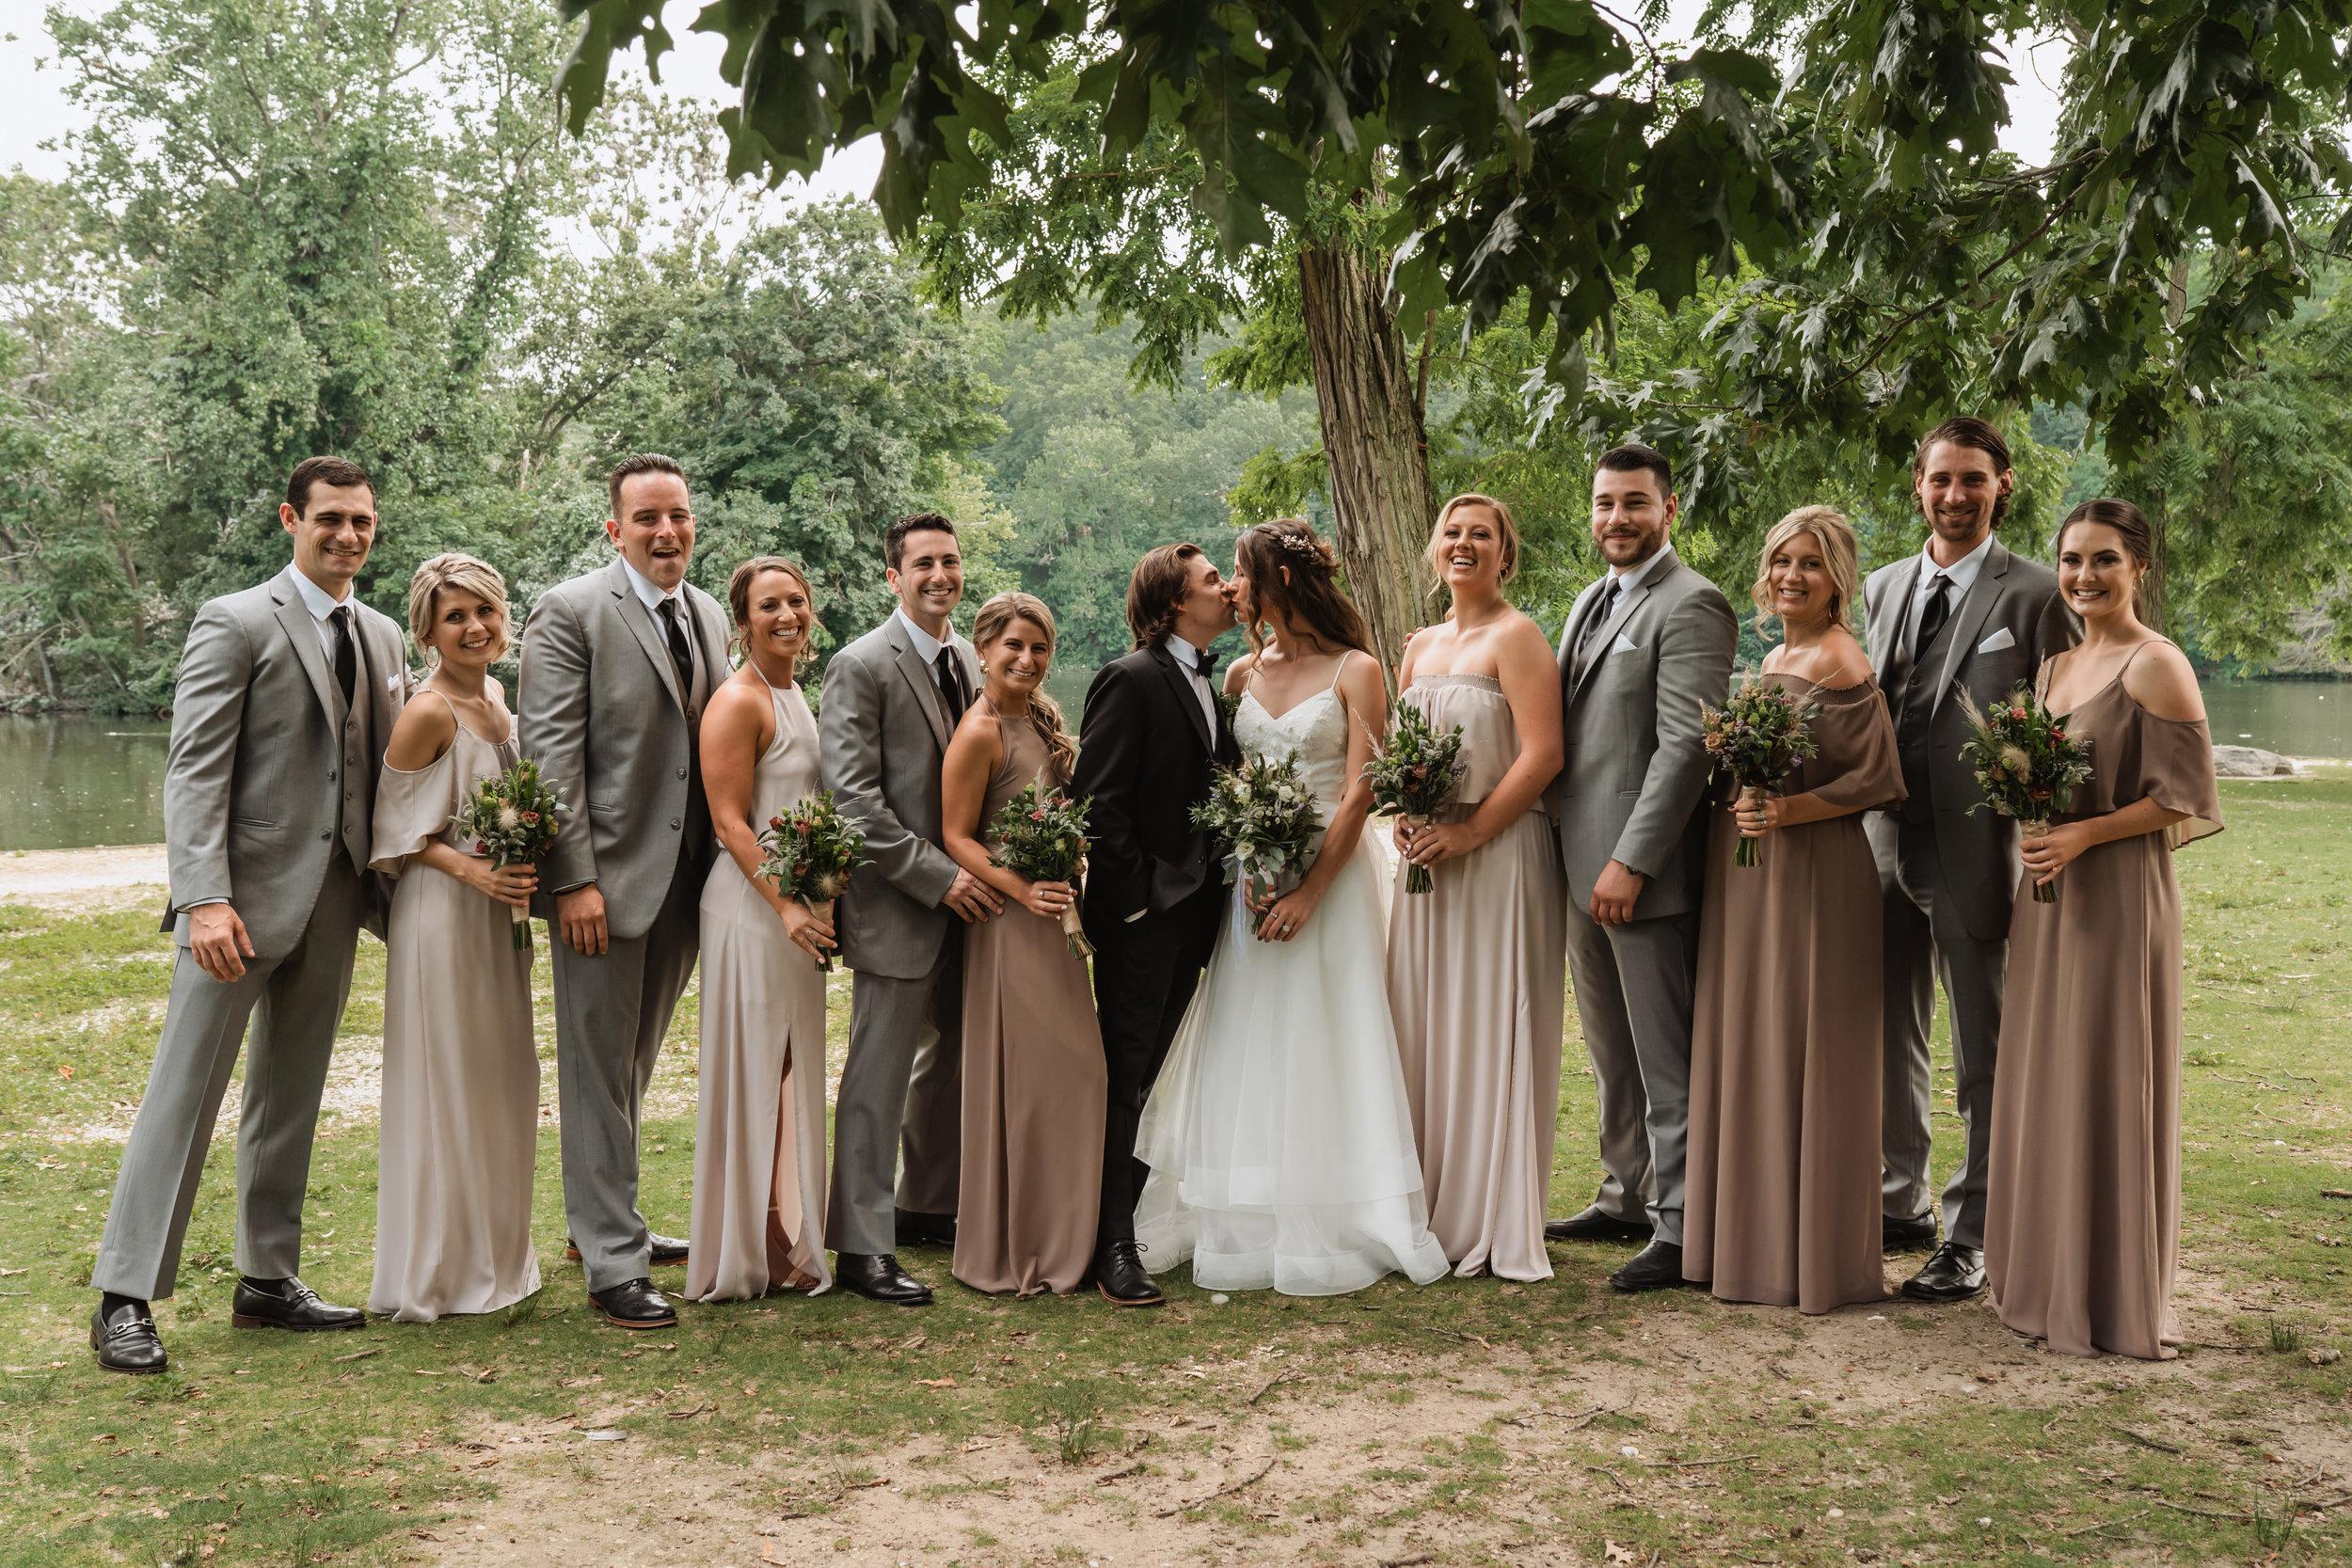 JJP_Emily&Joey_Summer_Old Field Club Wedding_22.jpg